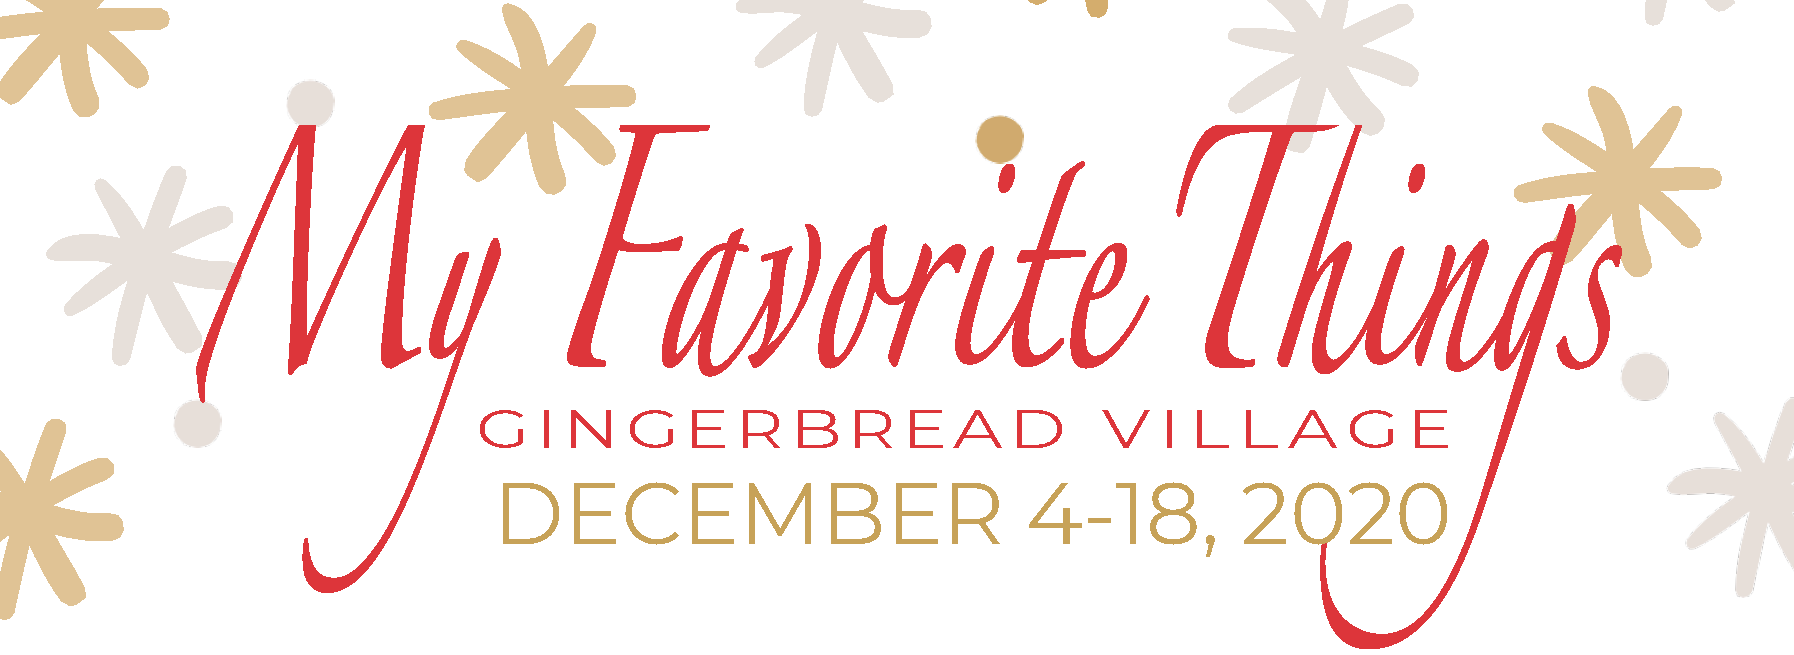 RiverCenter Gingerbread Village